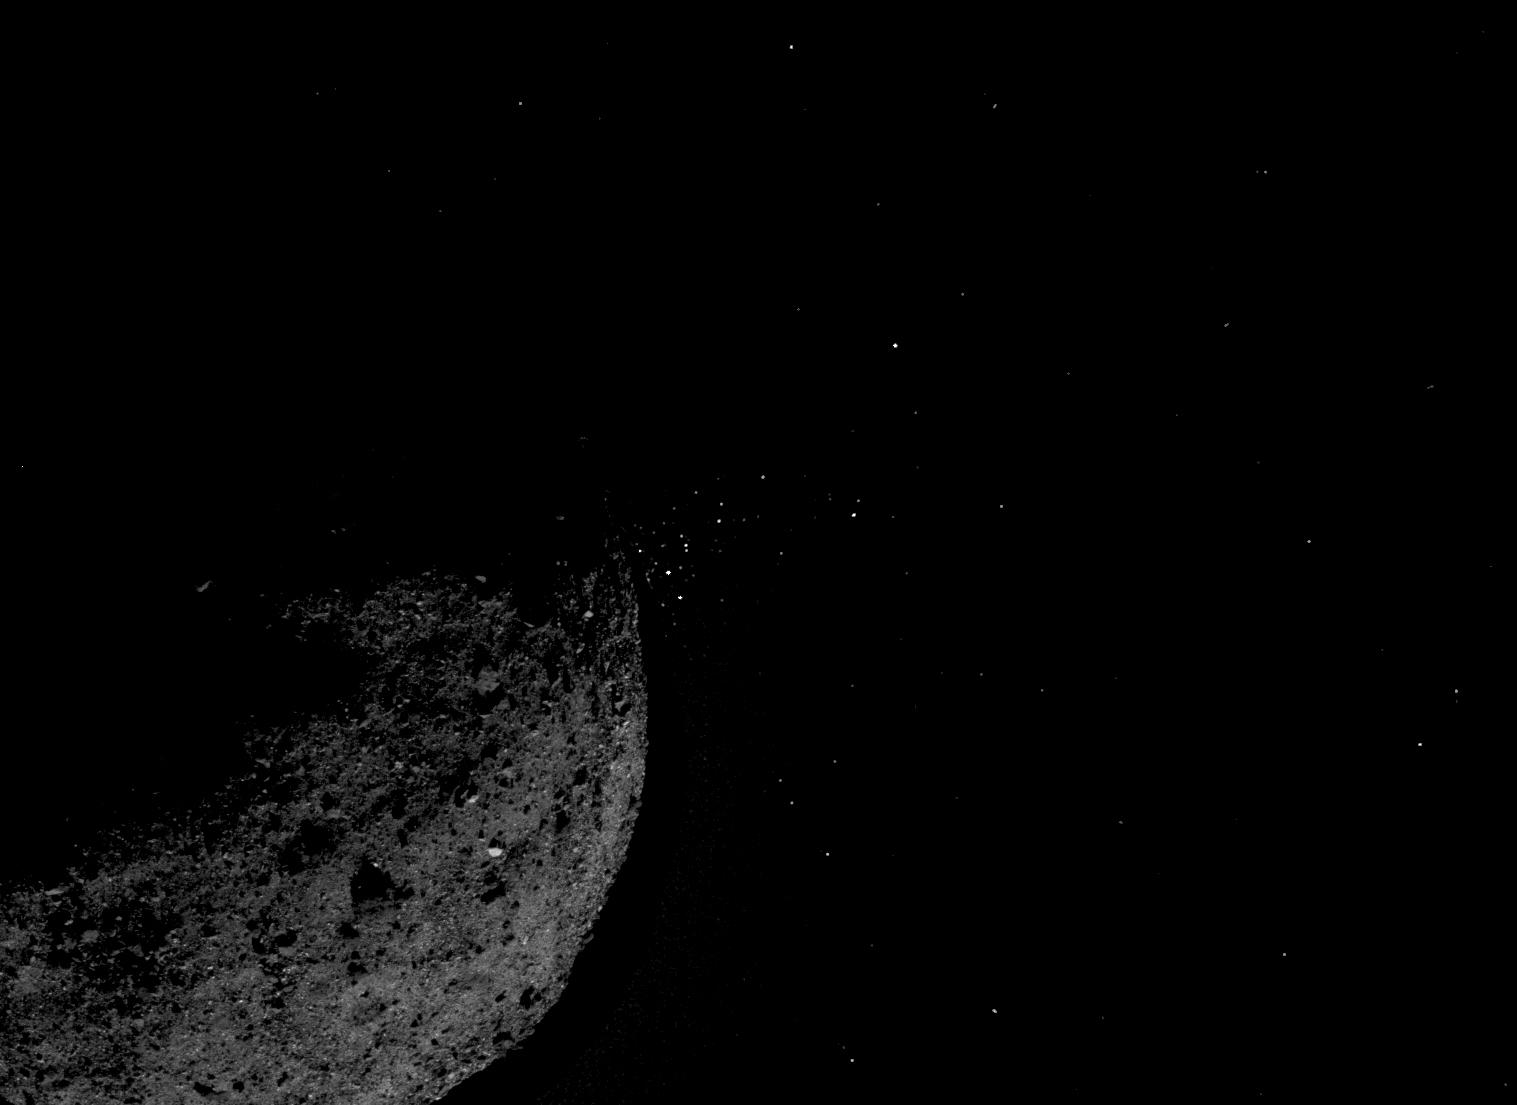 Nasa Mission Reveals Asteroid Has Big Surprises Nasa